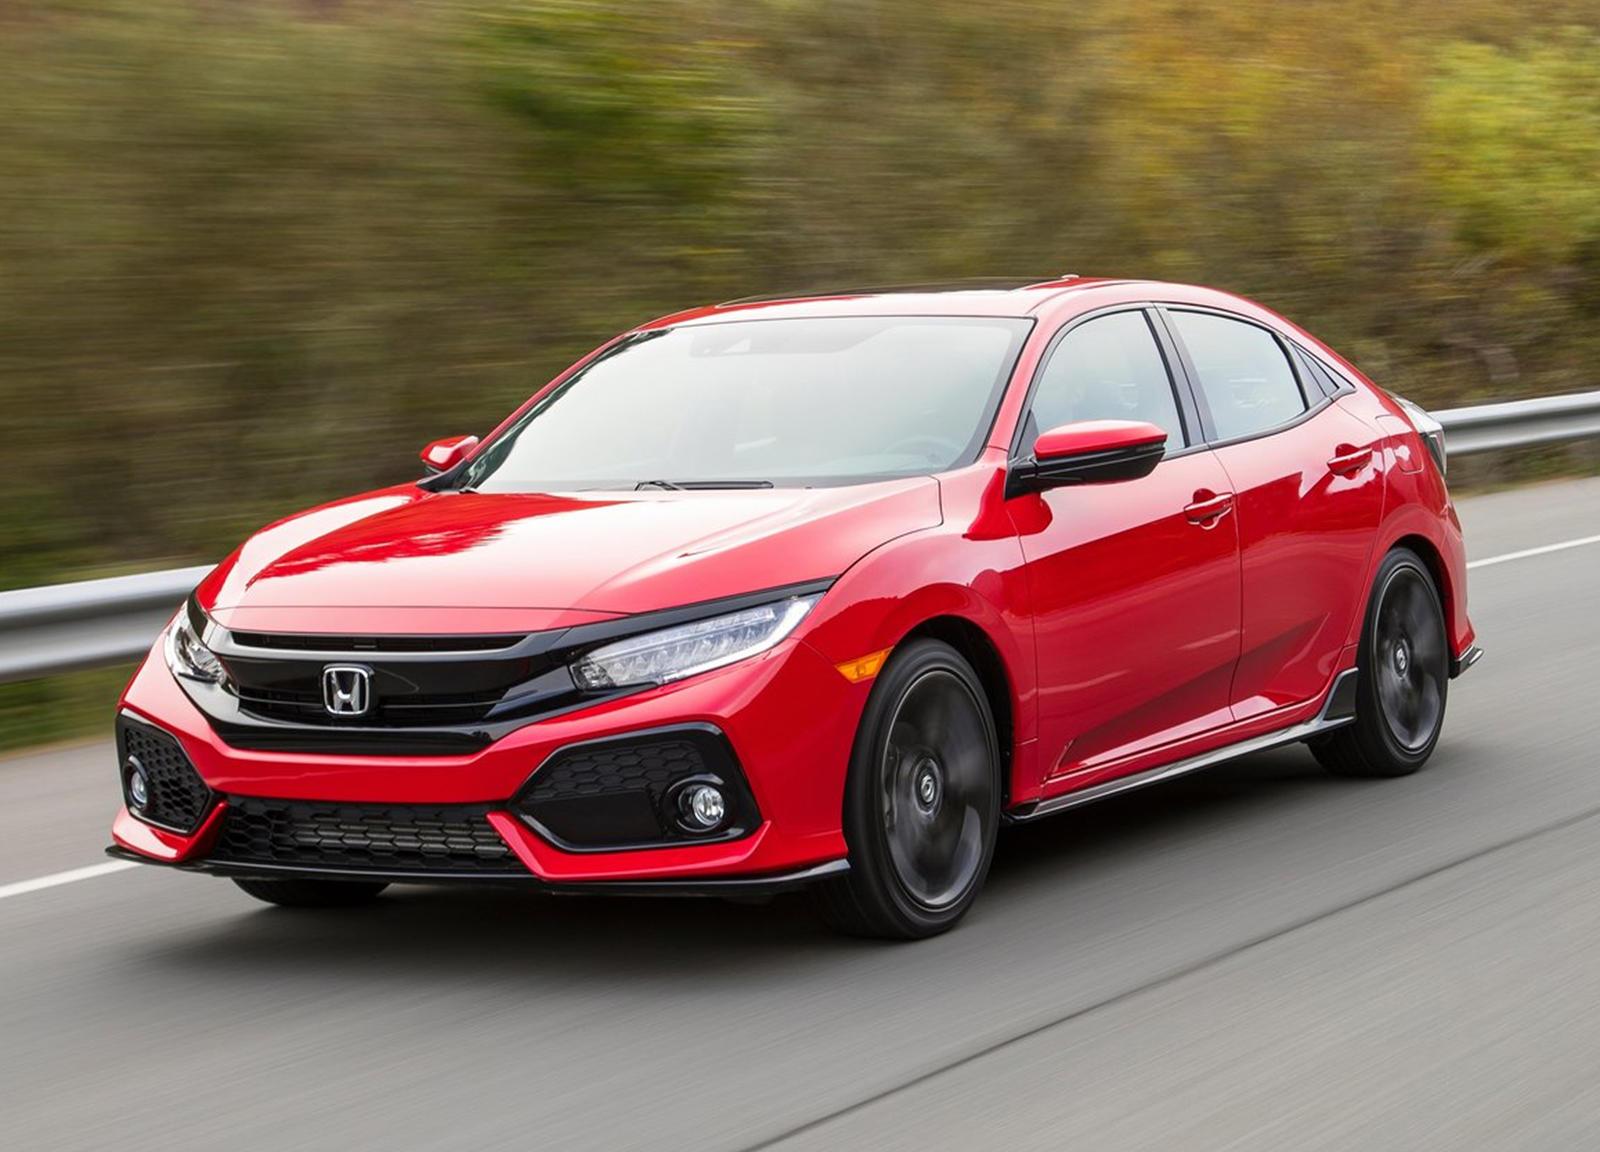 Honda's Popular Turbo Engine Is Causing Problems | CarBuzz